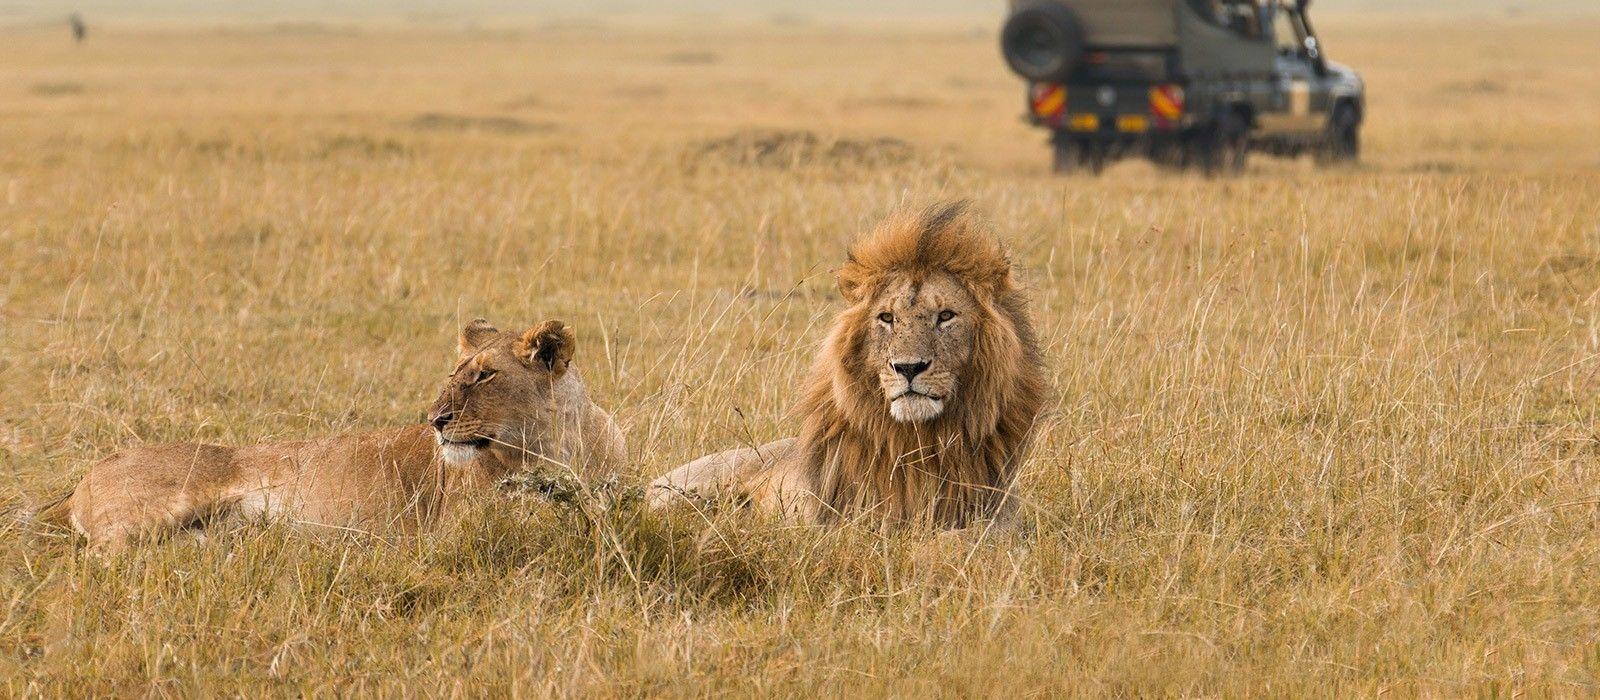 Kenia Hautnah: Safari Höhepunkte Urlaub 2